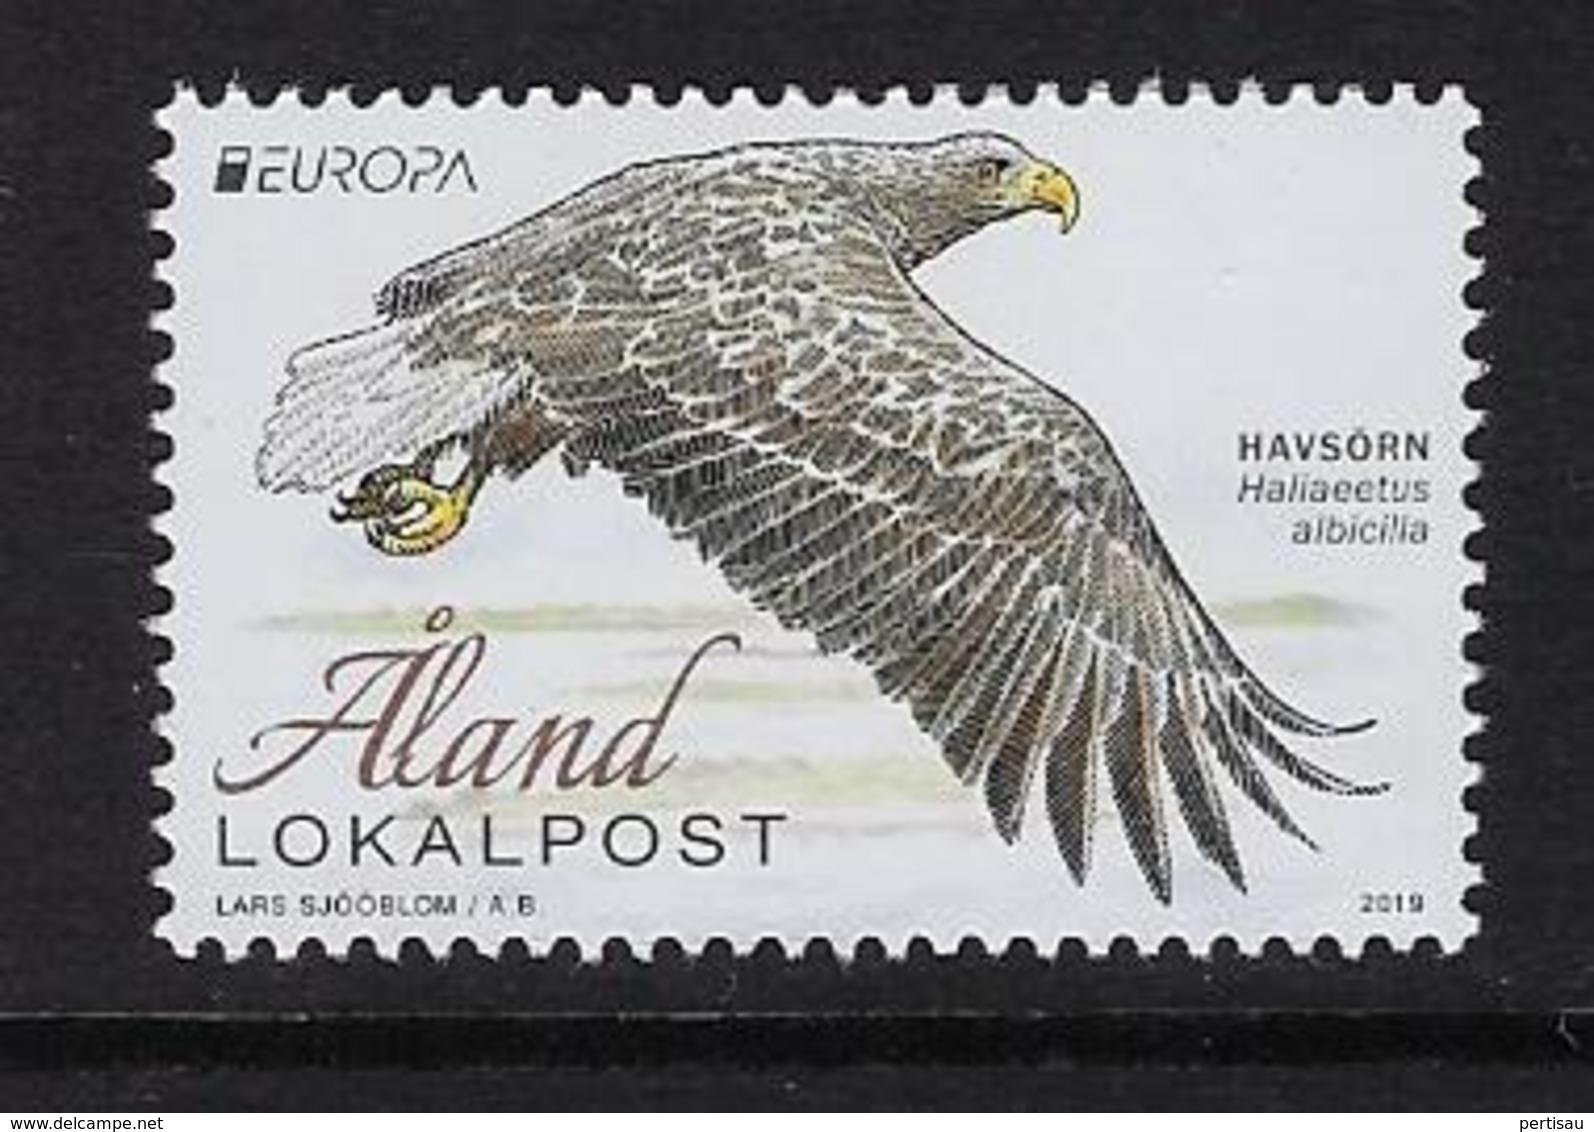 Aland - 2019